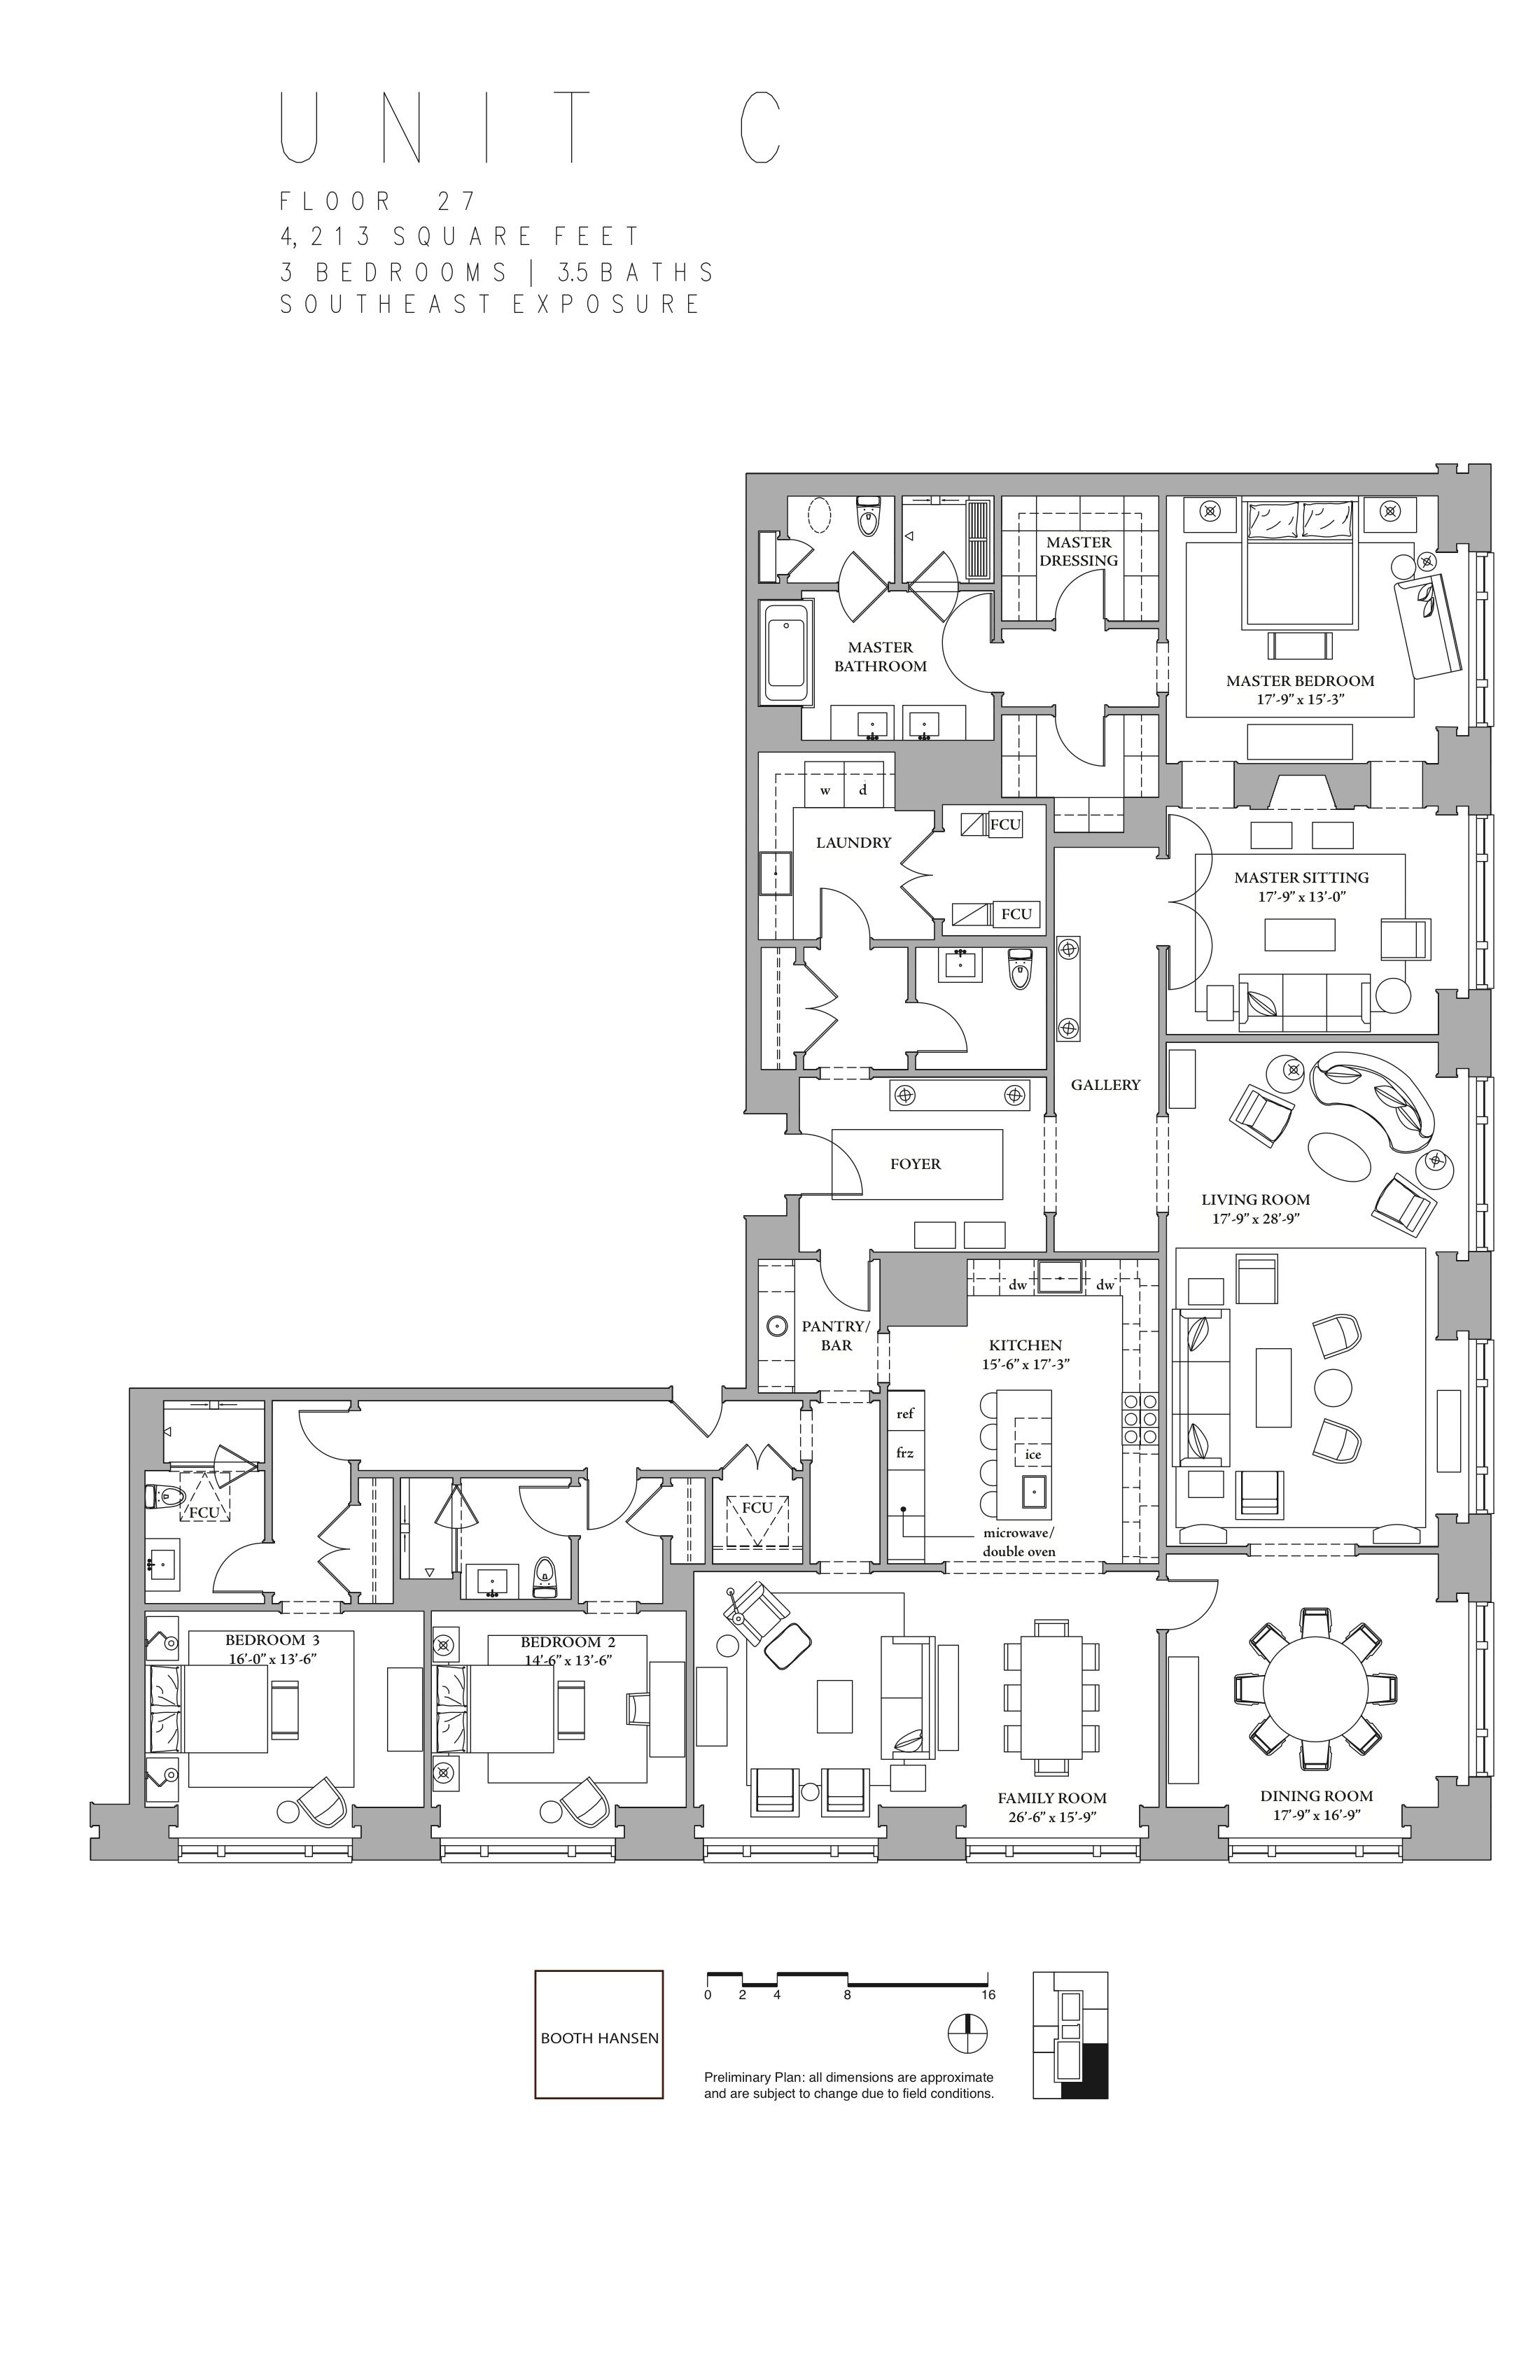 Apartment Decorating Games Online